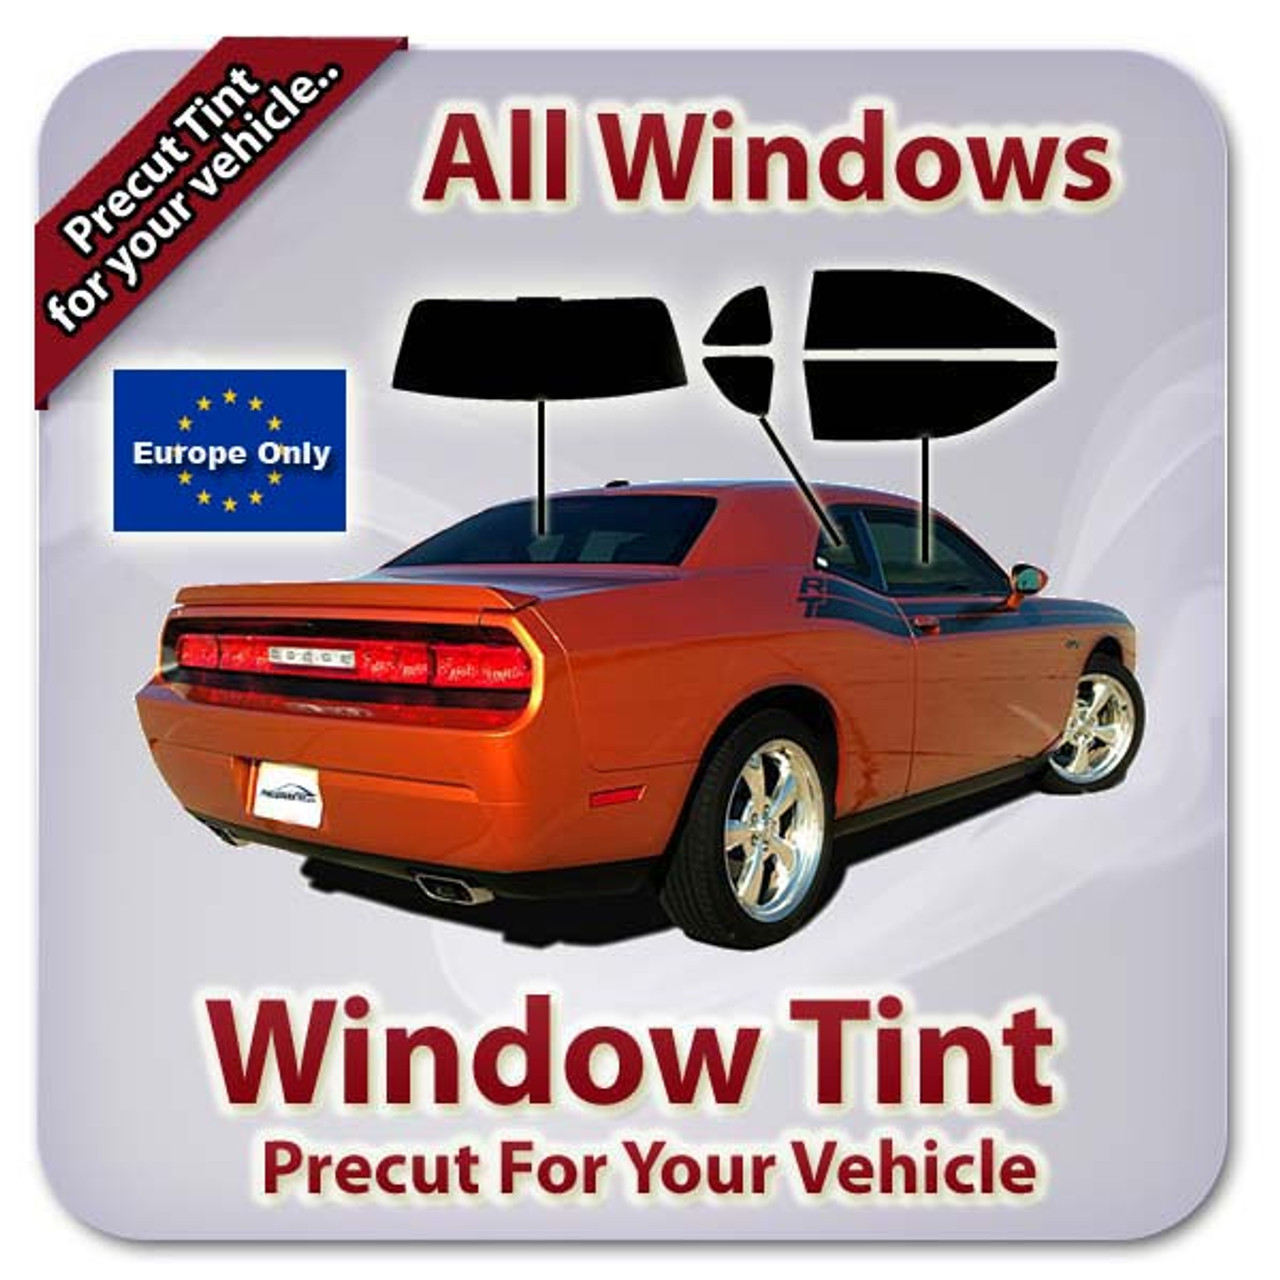 Mitsubishi pajero lwb 2000-2009 pre cut window tint//front windows